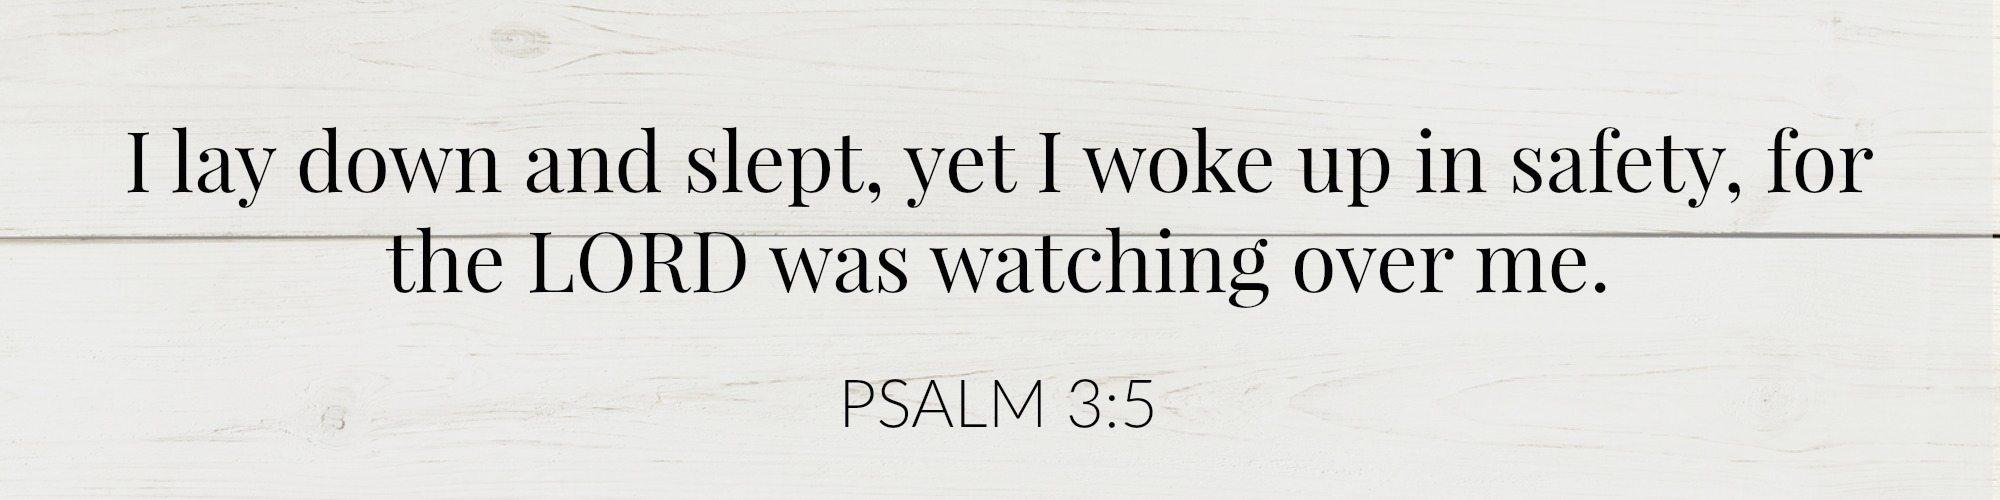 psalm-3-5